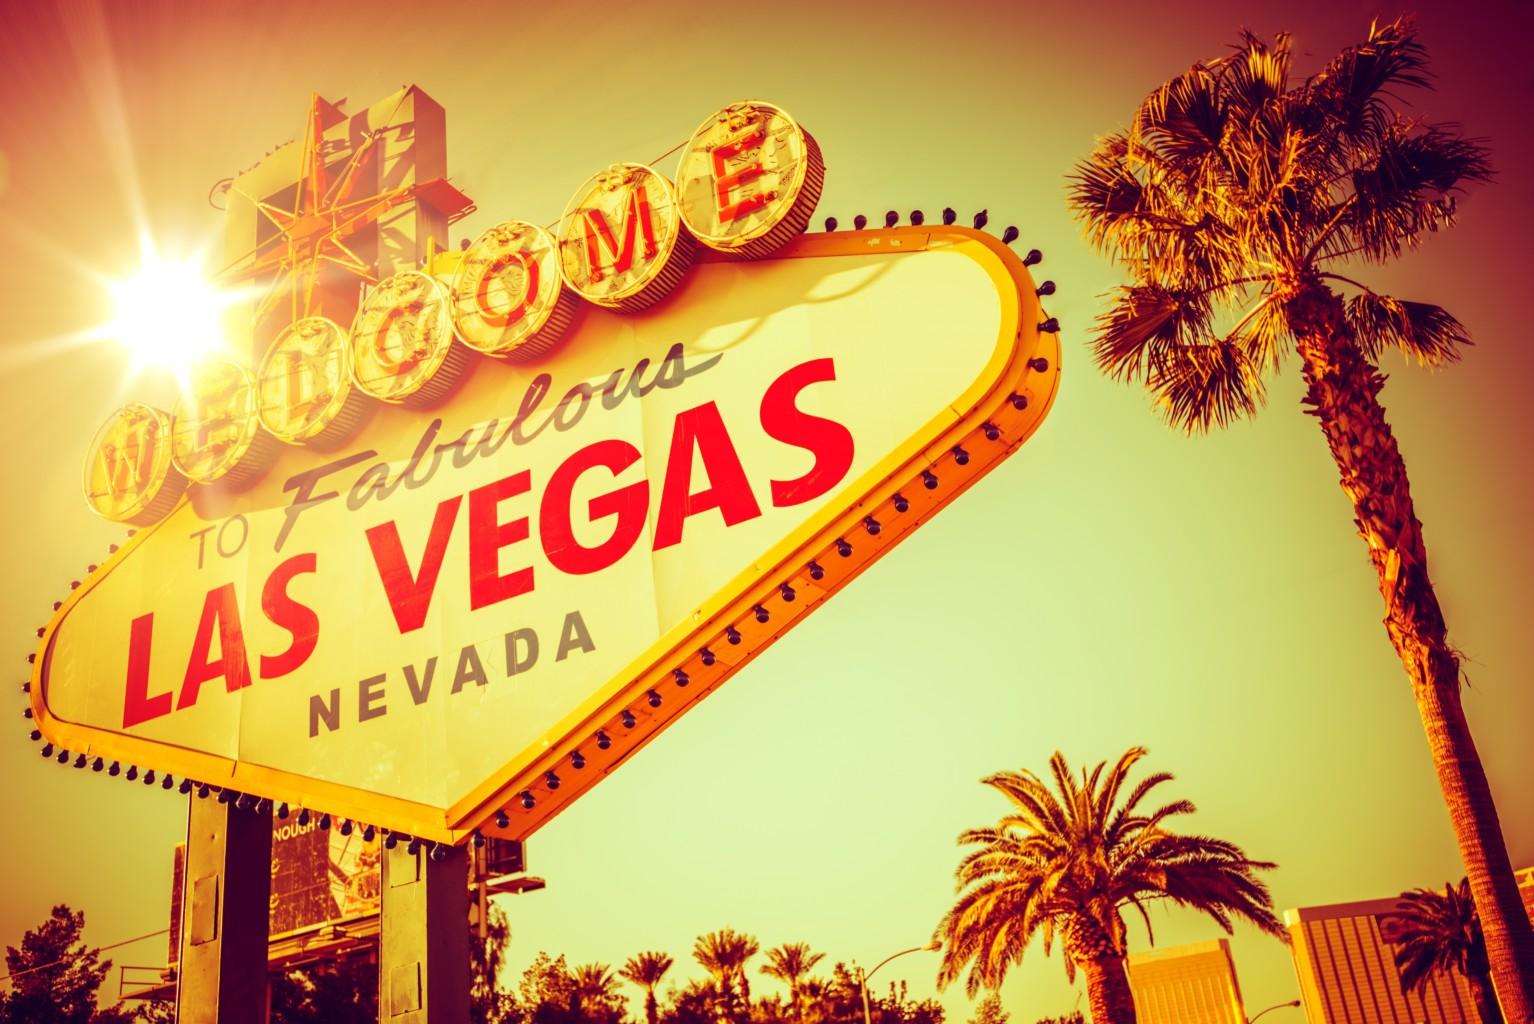 2019 Global Conference | Las Vegas